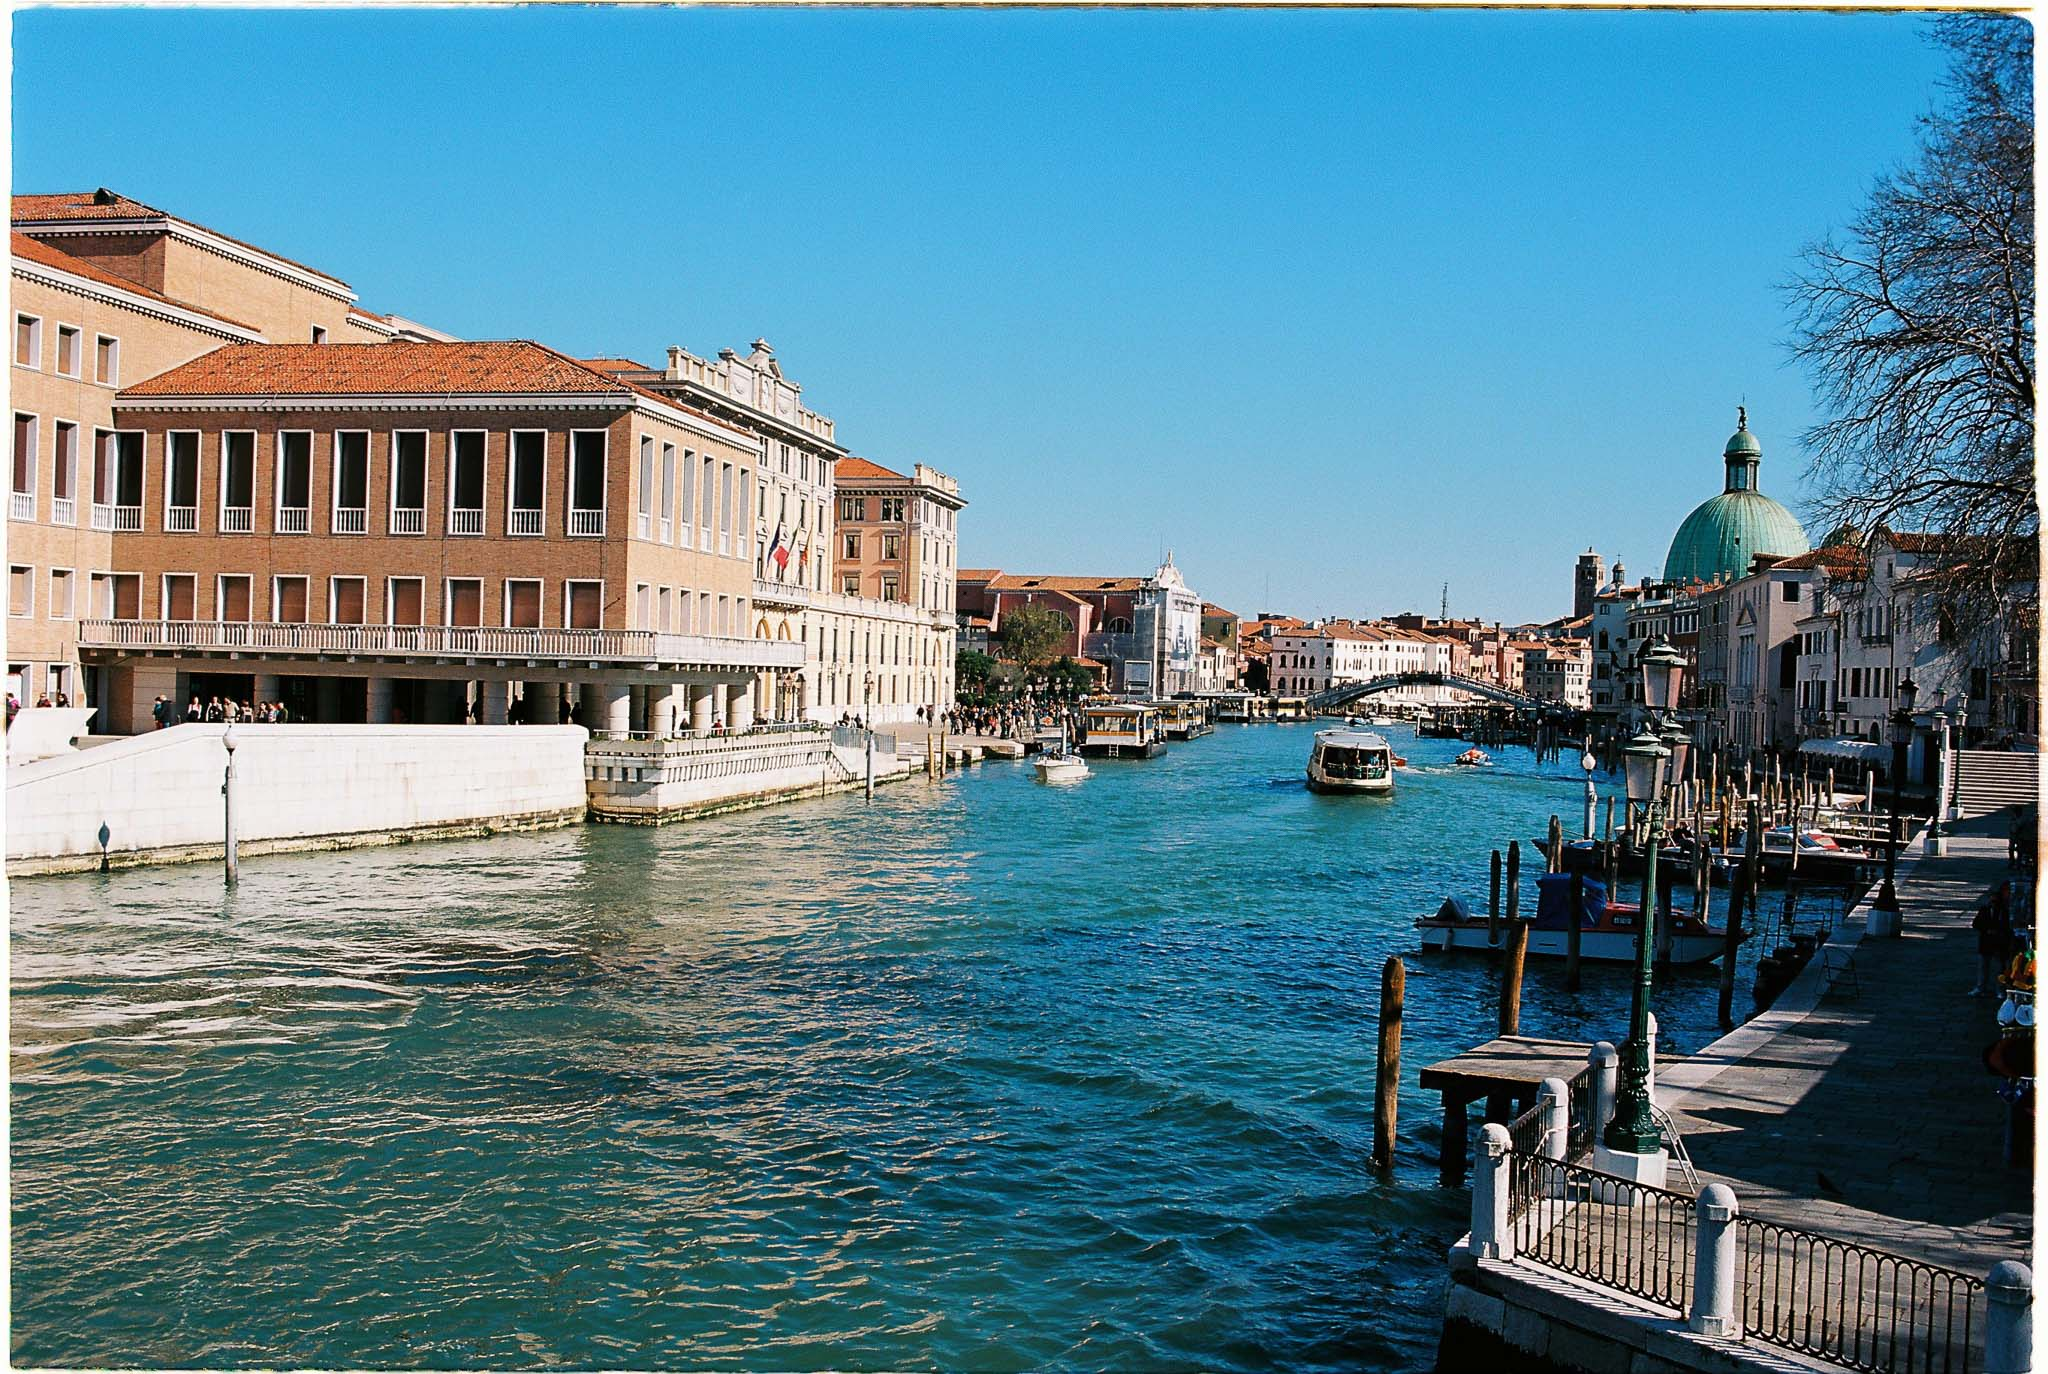 Venice Grad canal Kodak Ektar 100 Nikon F100